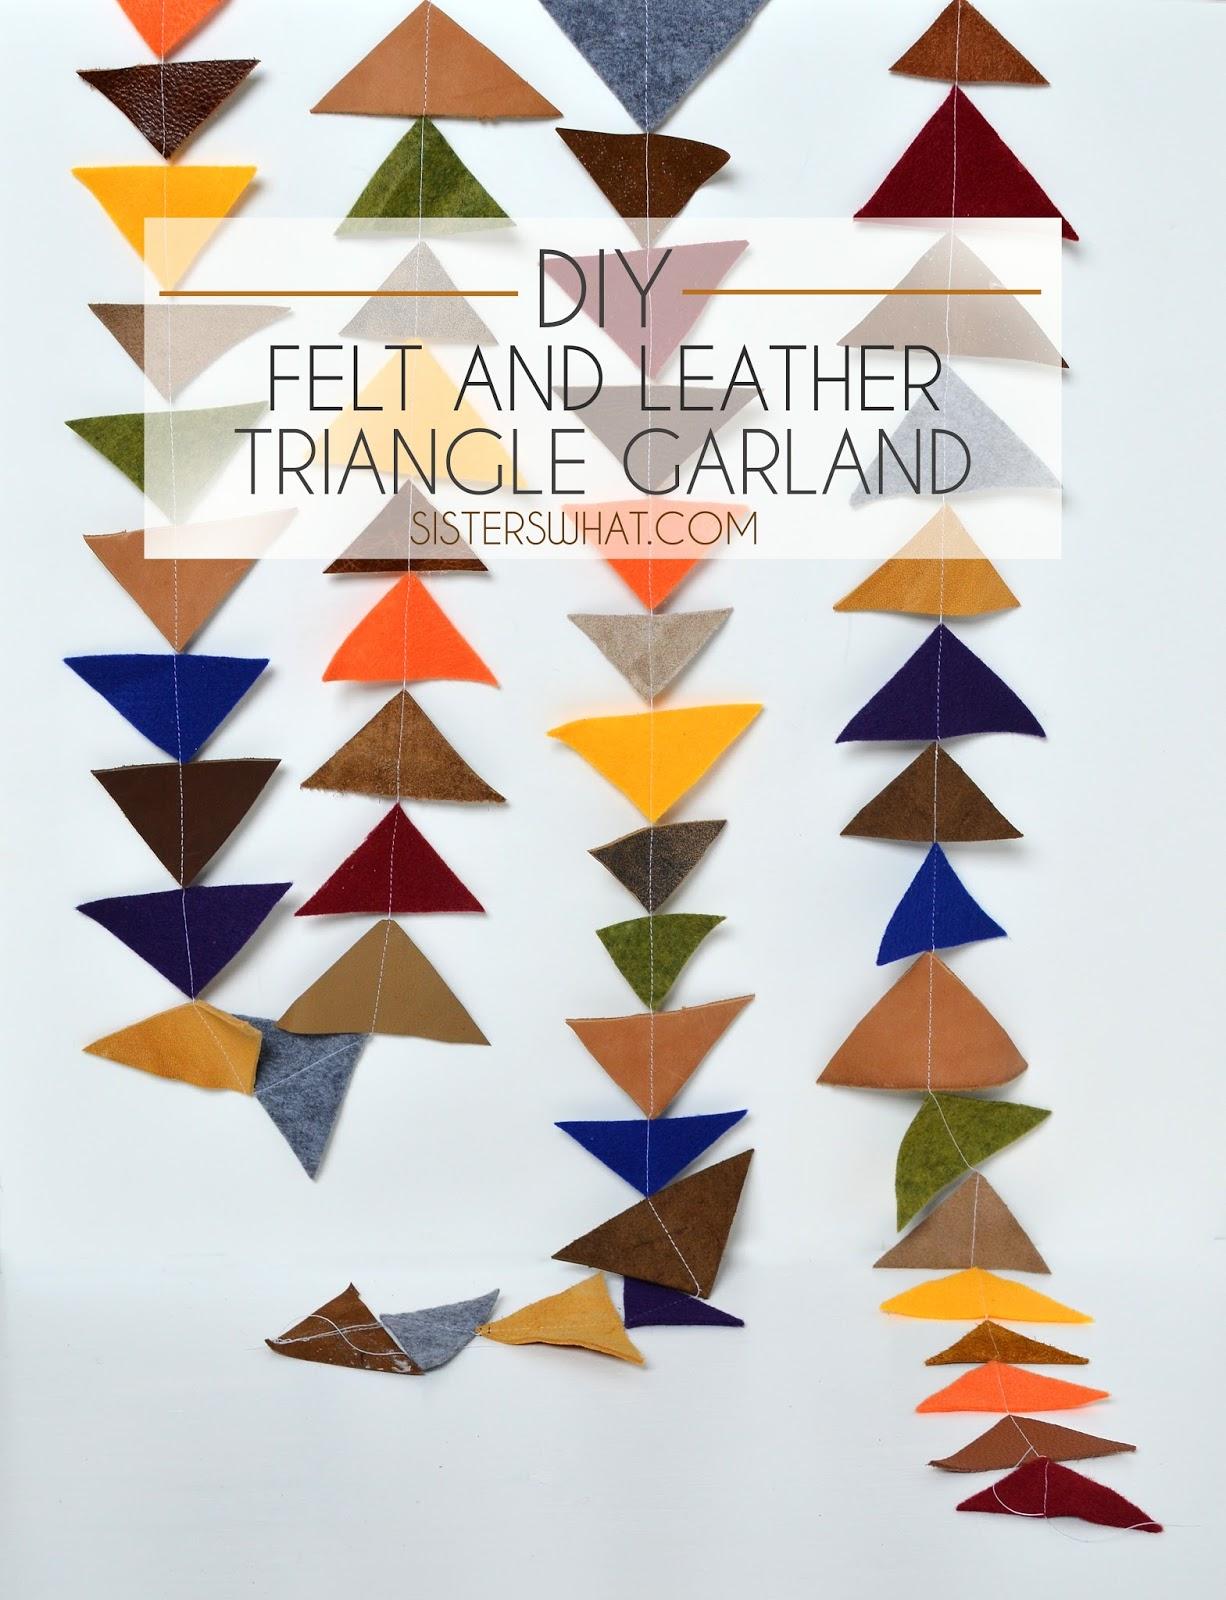 DIY felt and leather Triangle #Garland